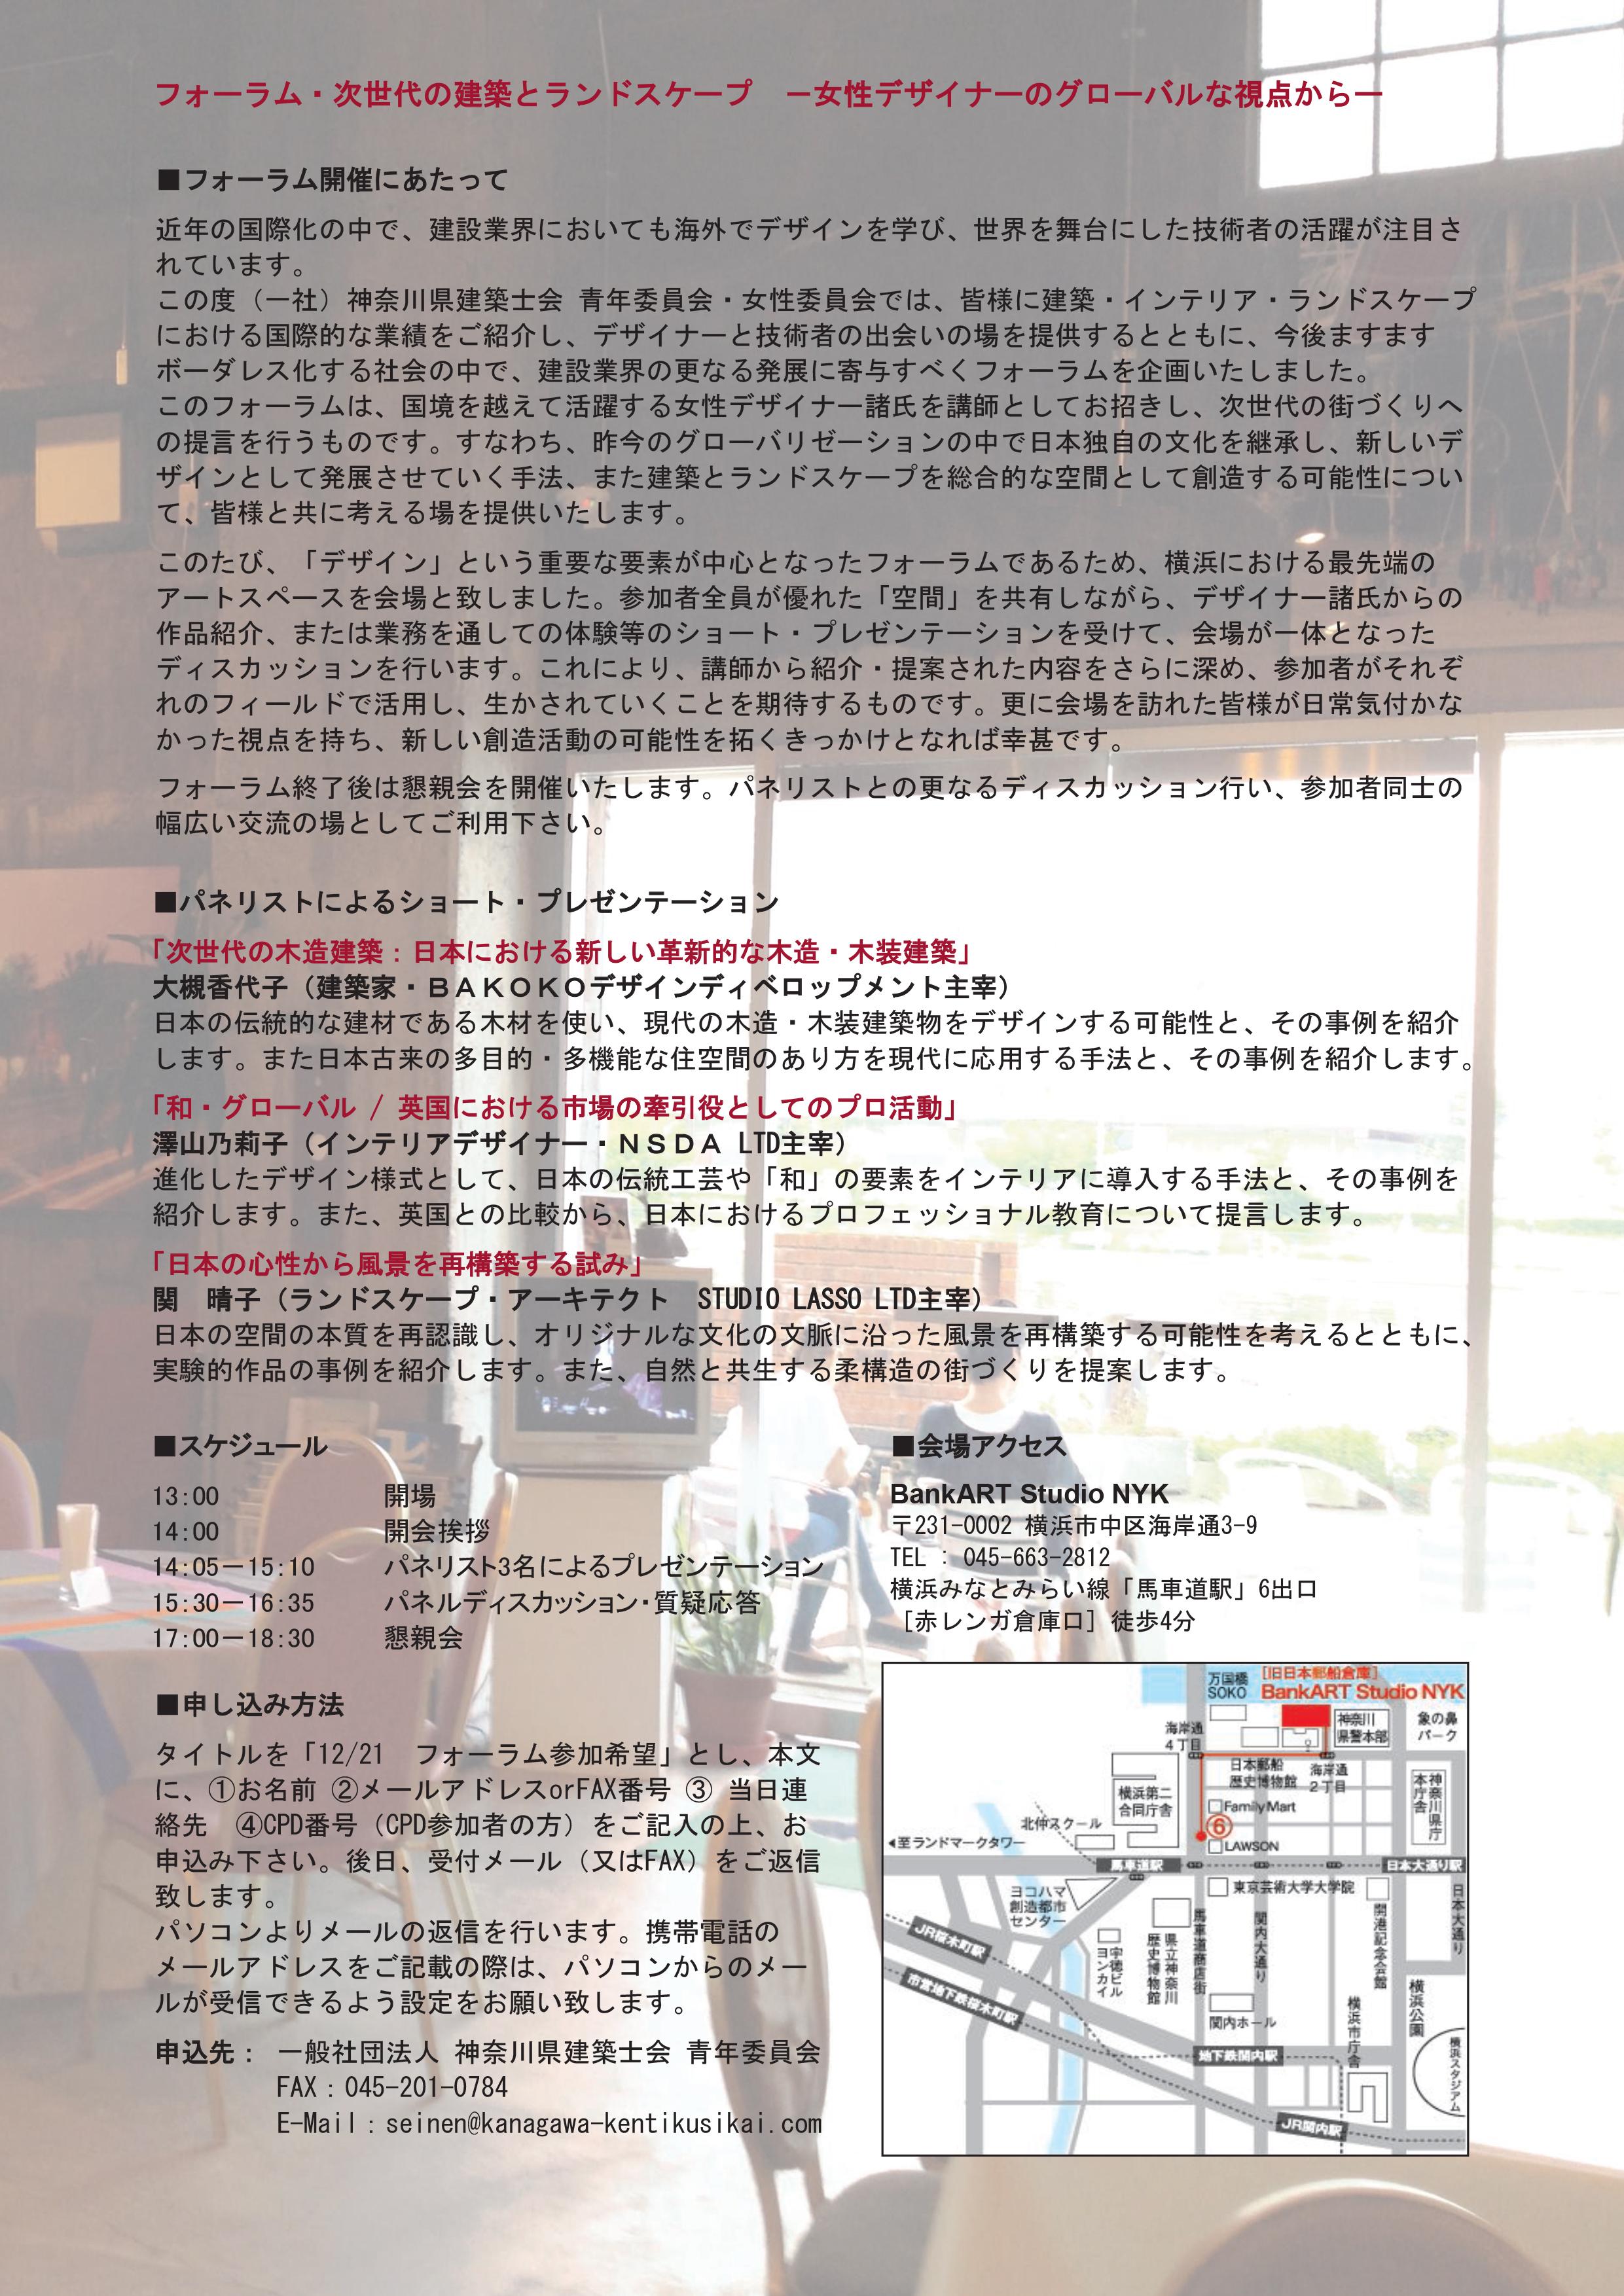 Forum detail information (Click to enlarge)